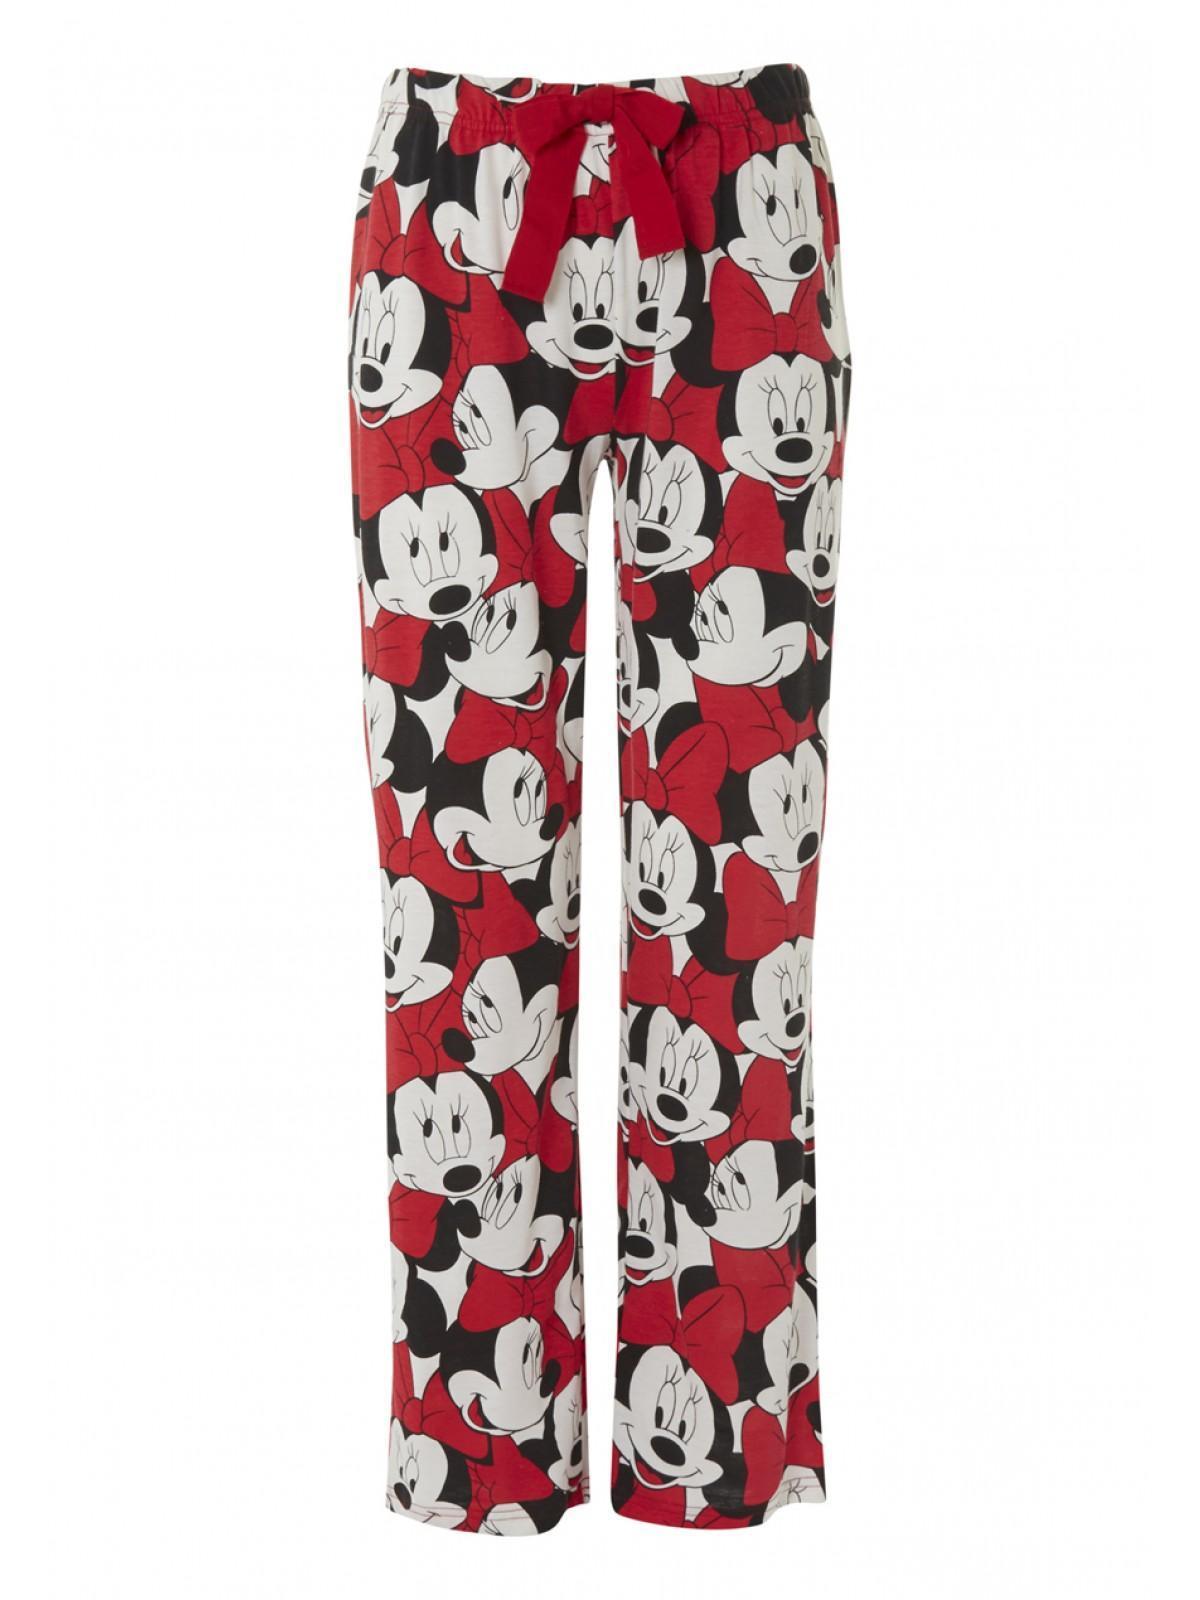 Womens Minnie Mouse Pyjama Bottoms | Peacocks